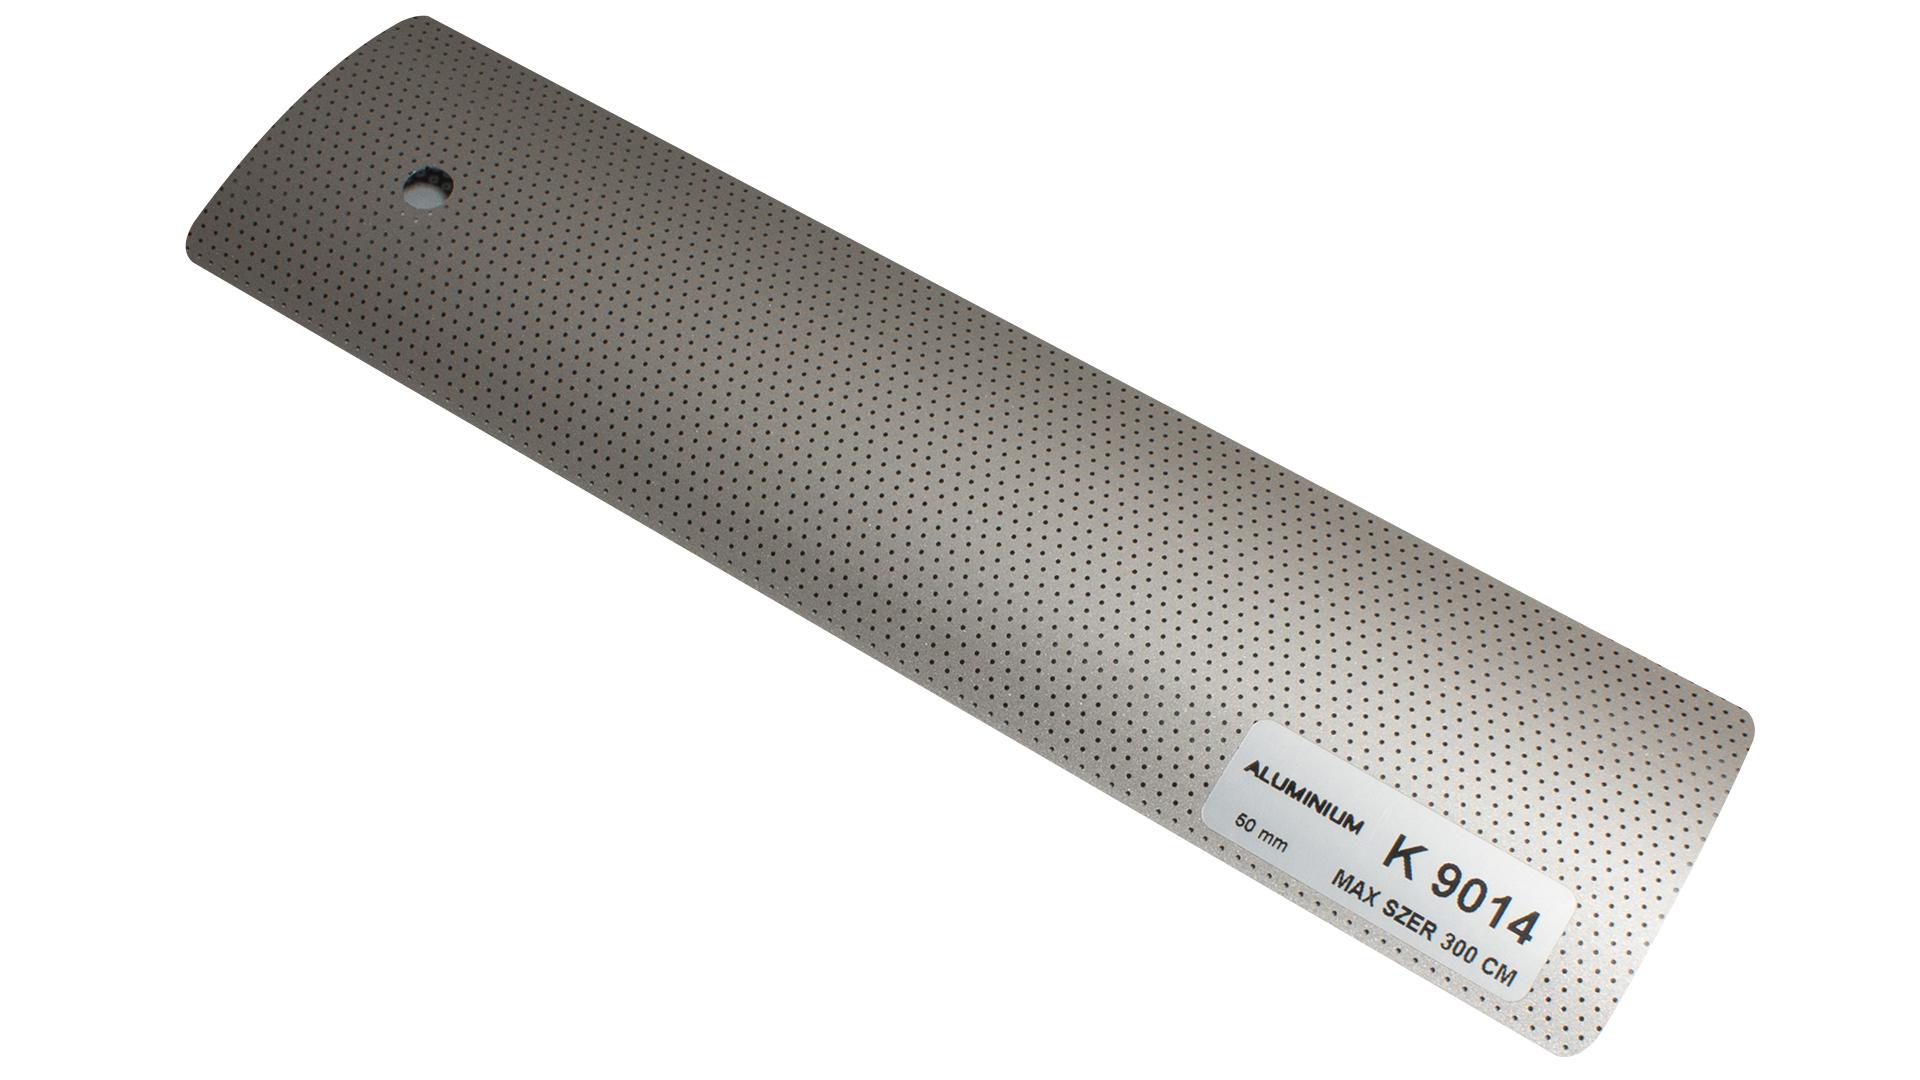 K9014